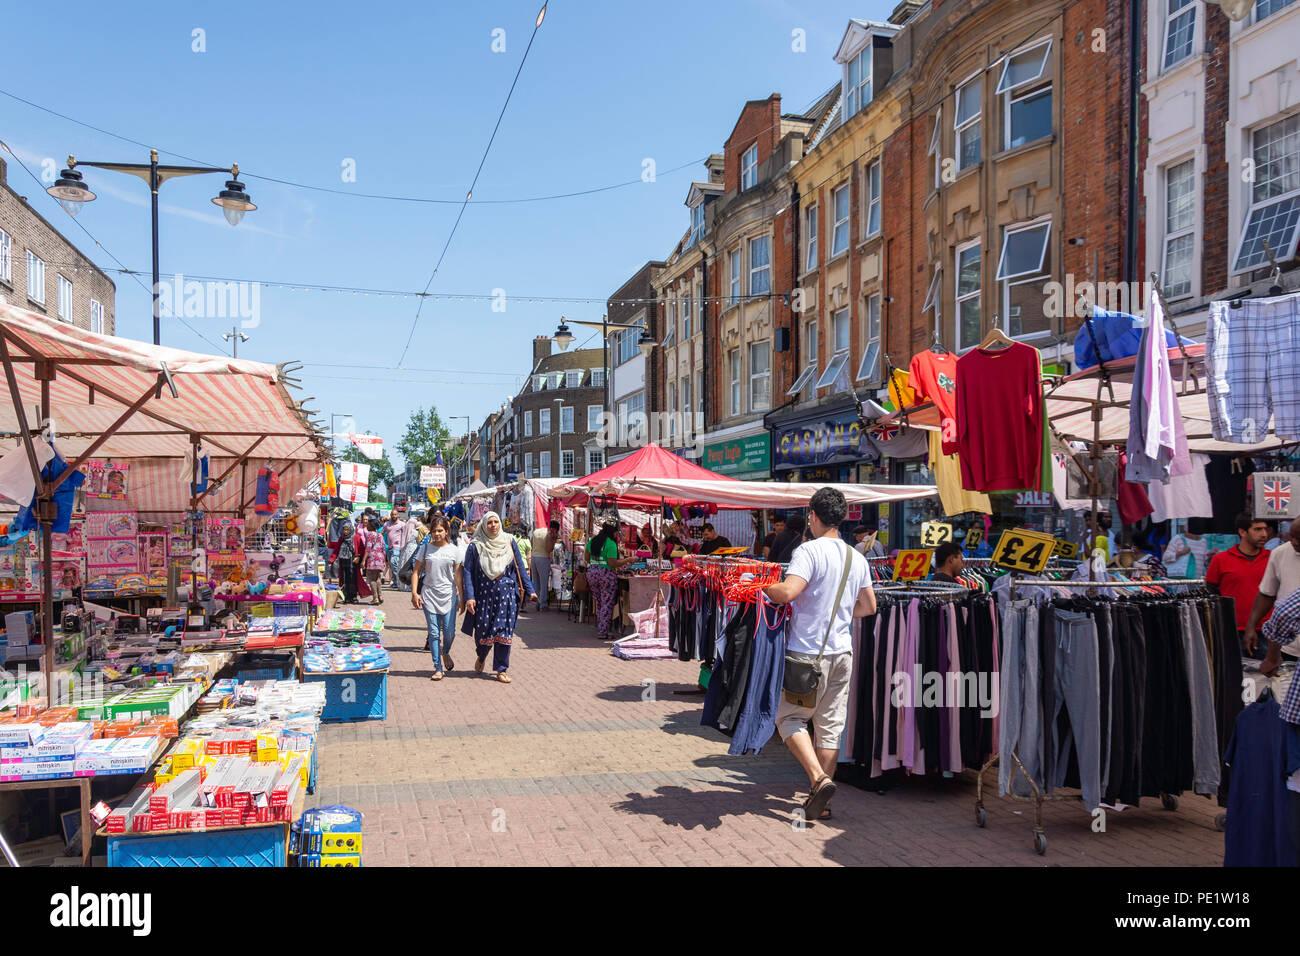 Marché de rue qui aboient, East Street, London, London Borough of Barnet, Greater London, Angleterre, Royaume-Uni Photo Stock